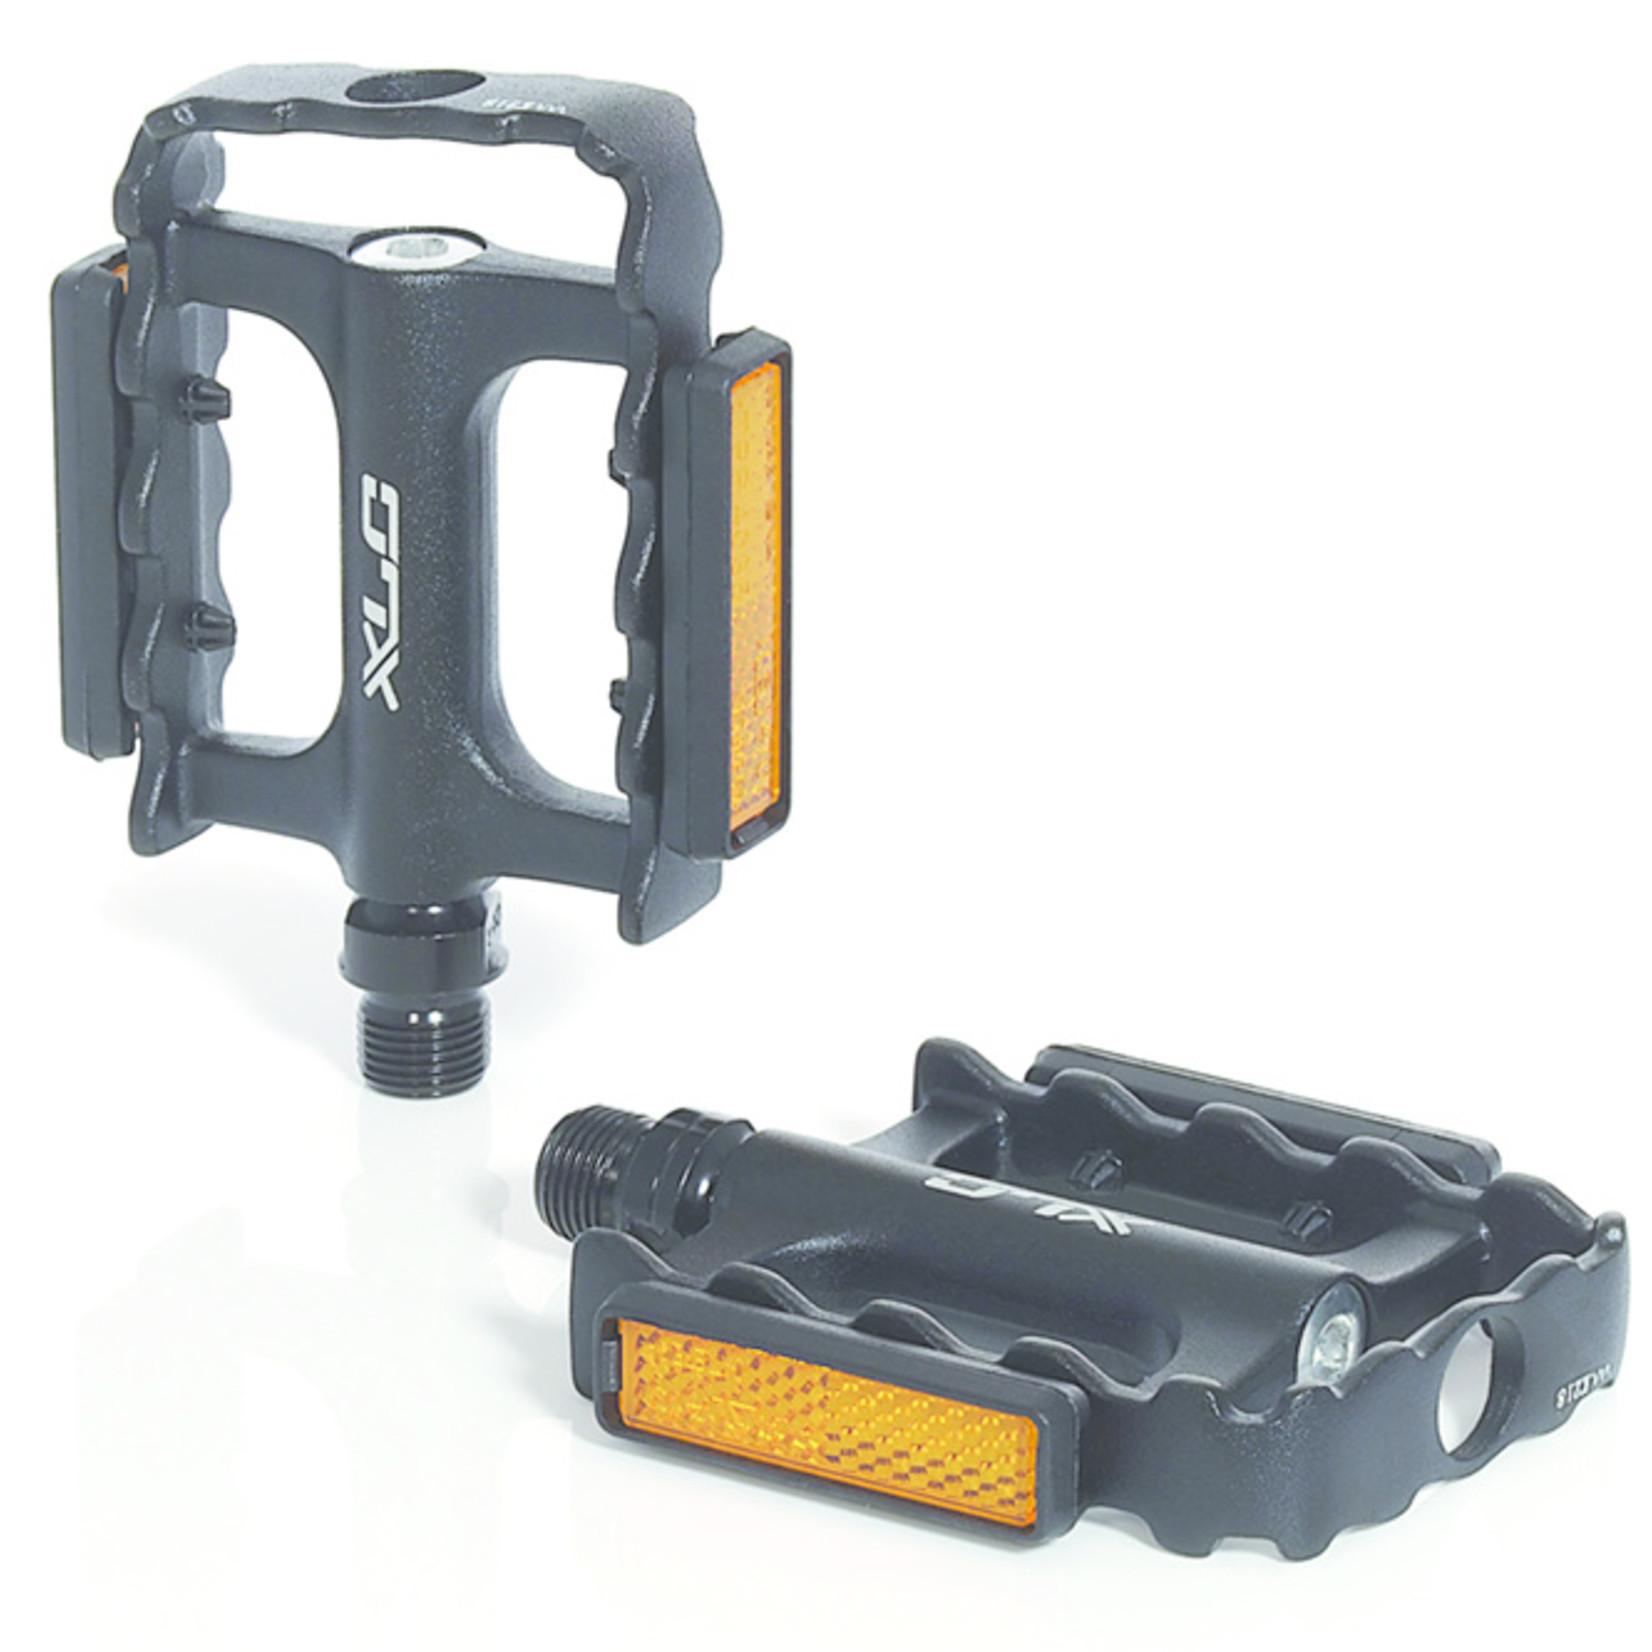 XLC XLC Ulight All Black Pedal